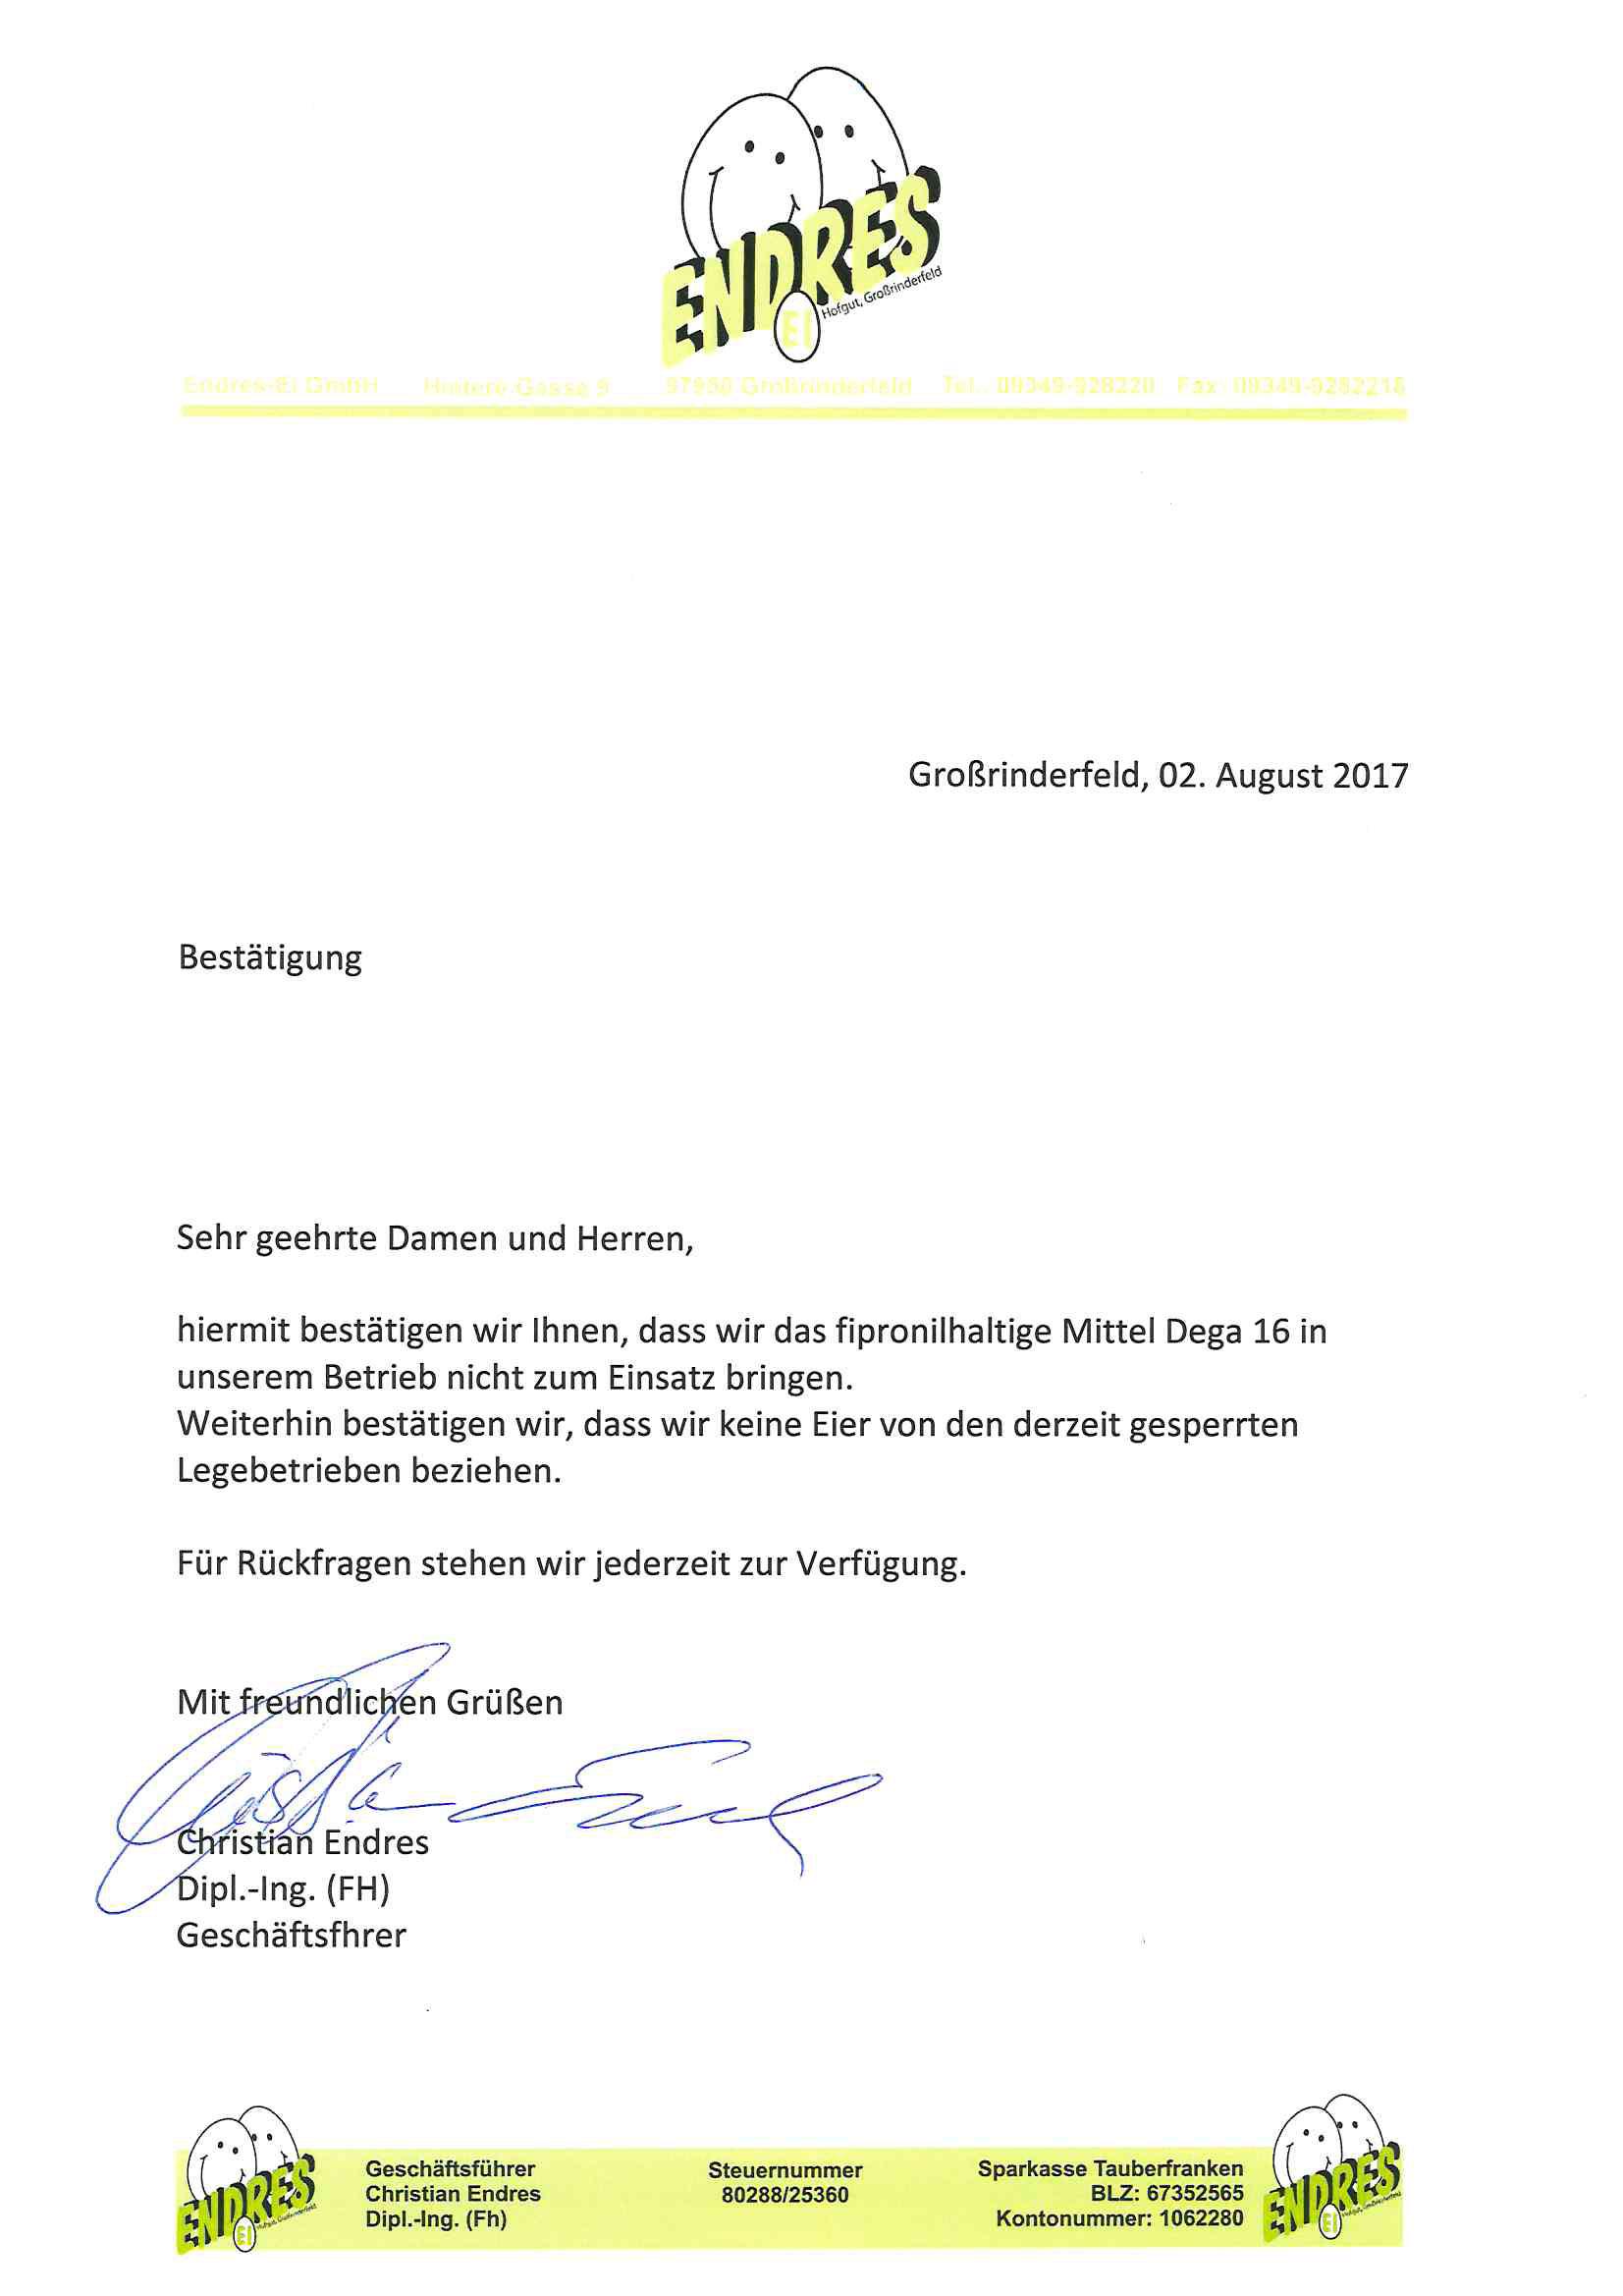 Bestatigung-Fipronil